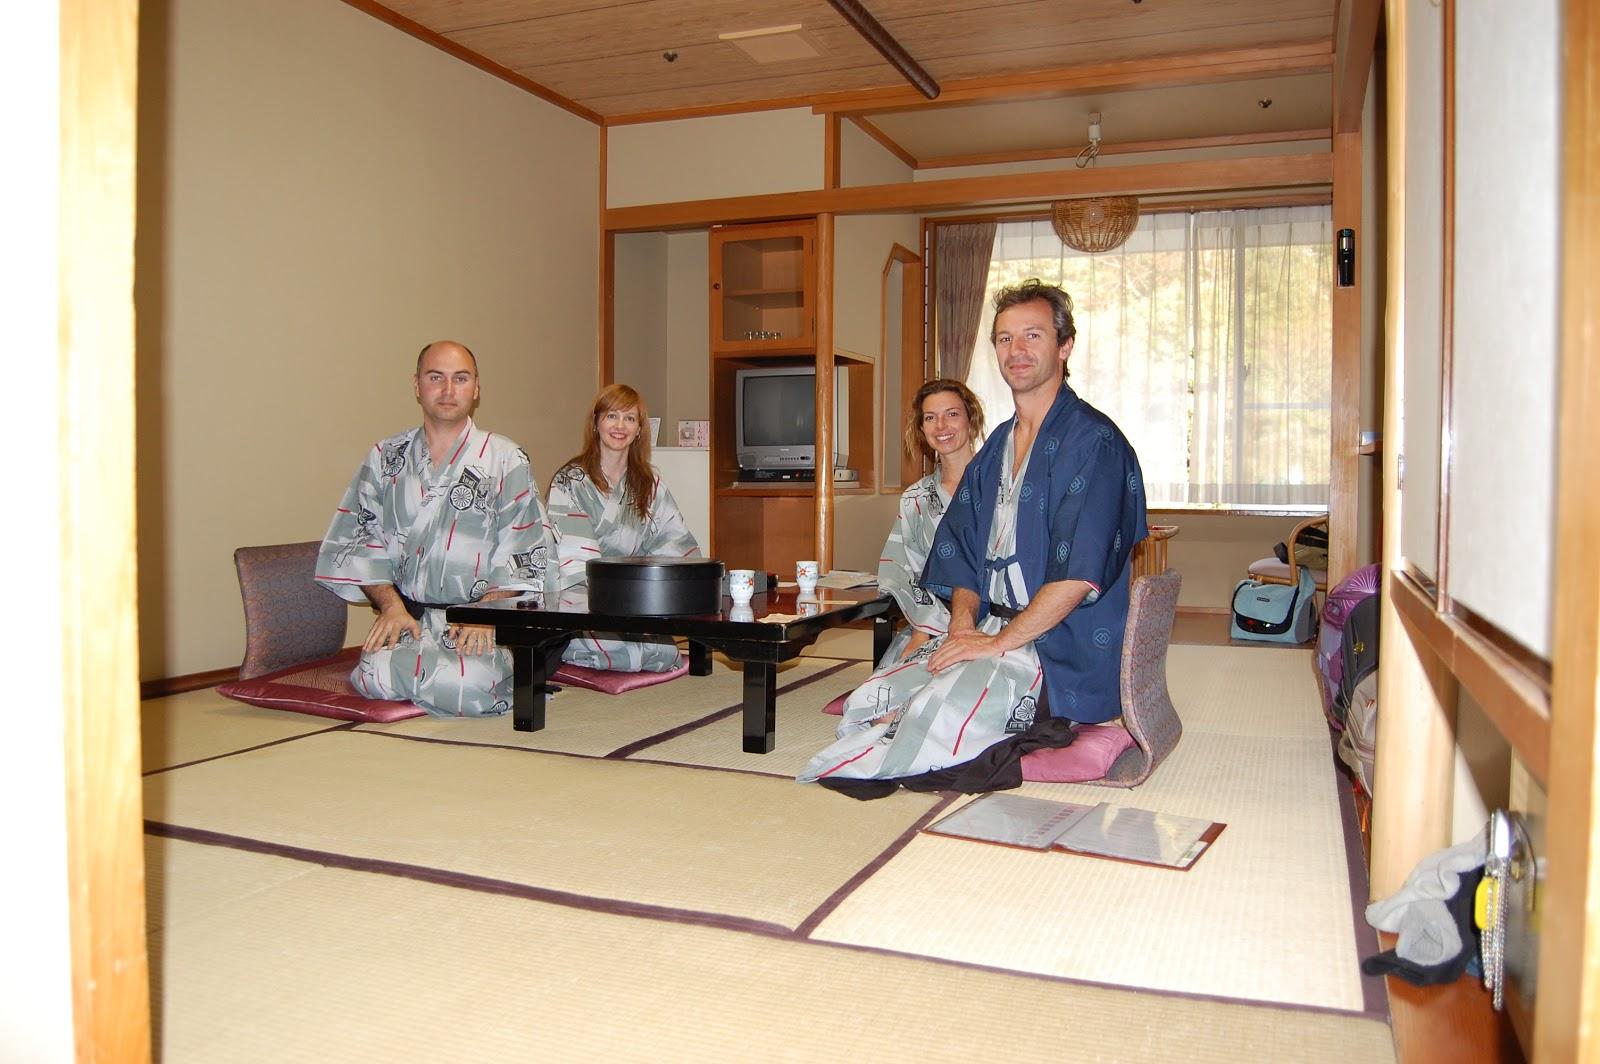 La paluluta la mam de leo la mesa nueva for Mesa japonesa tradicional